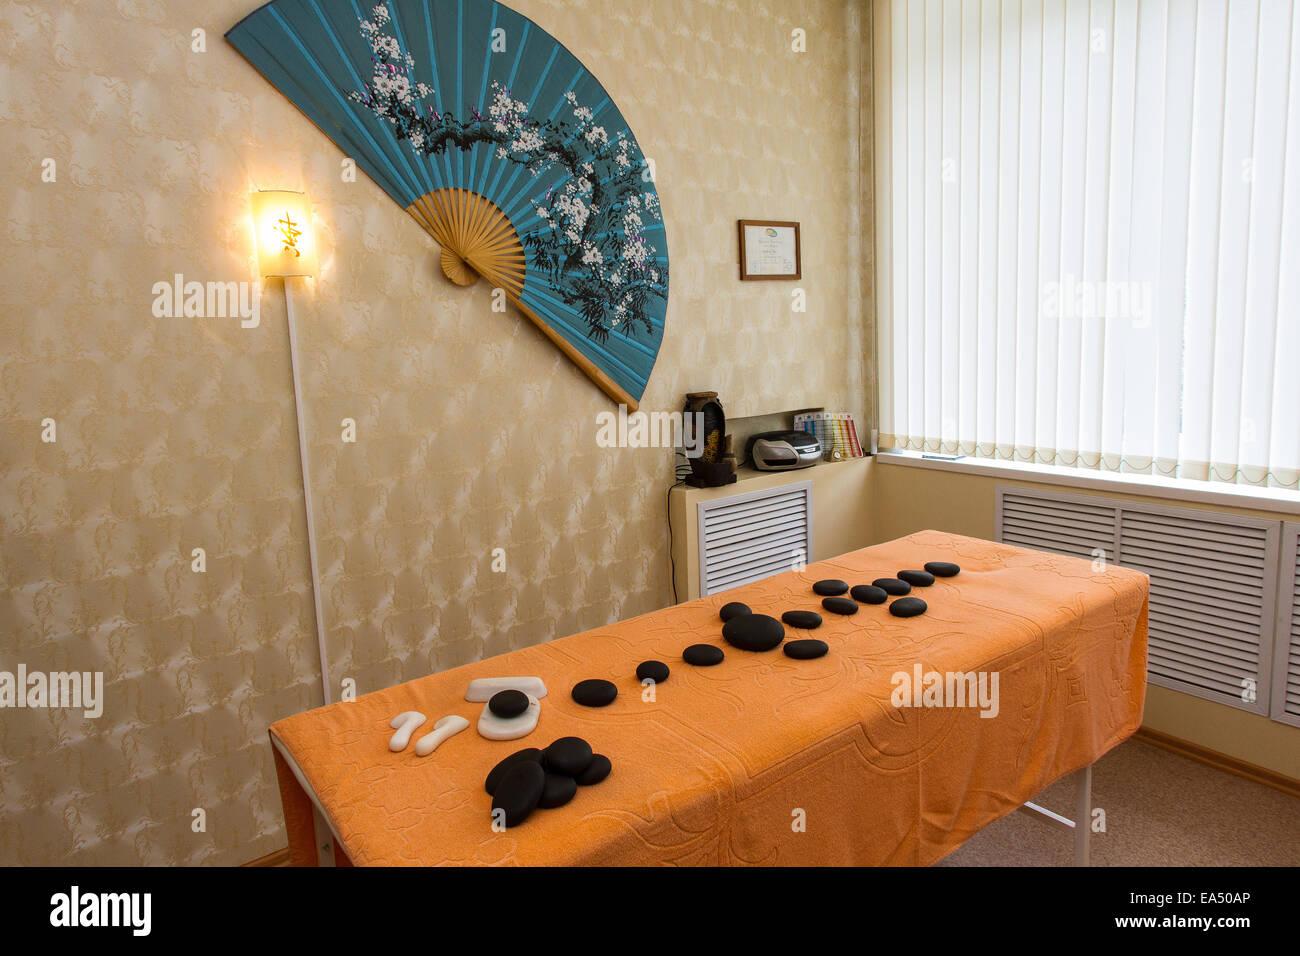 Massage table, stone therapy, spa salon - Stock Image